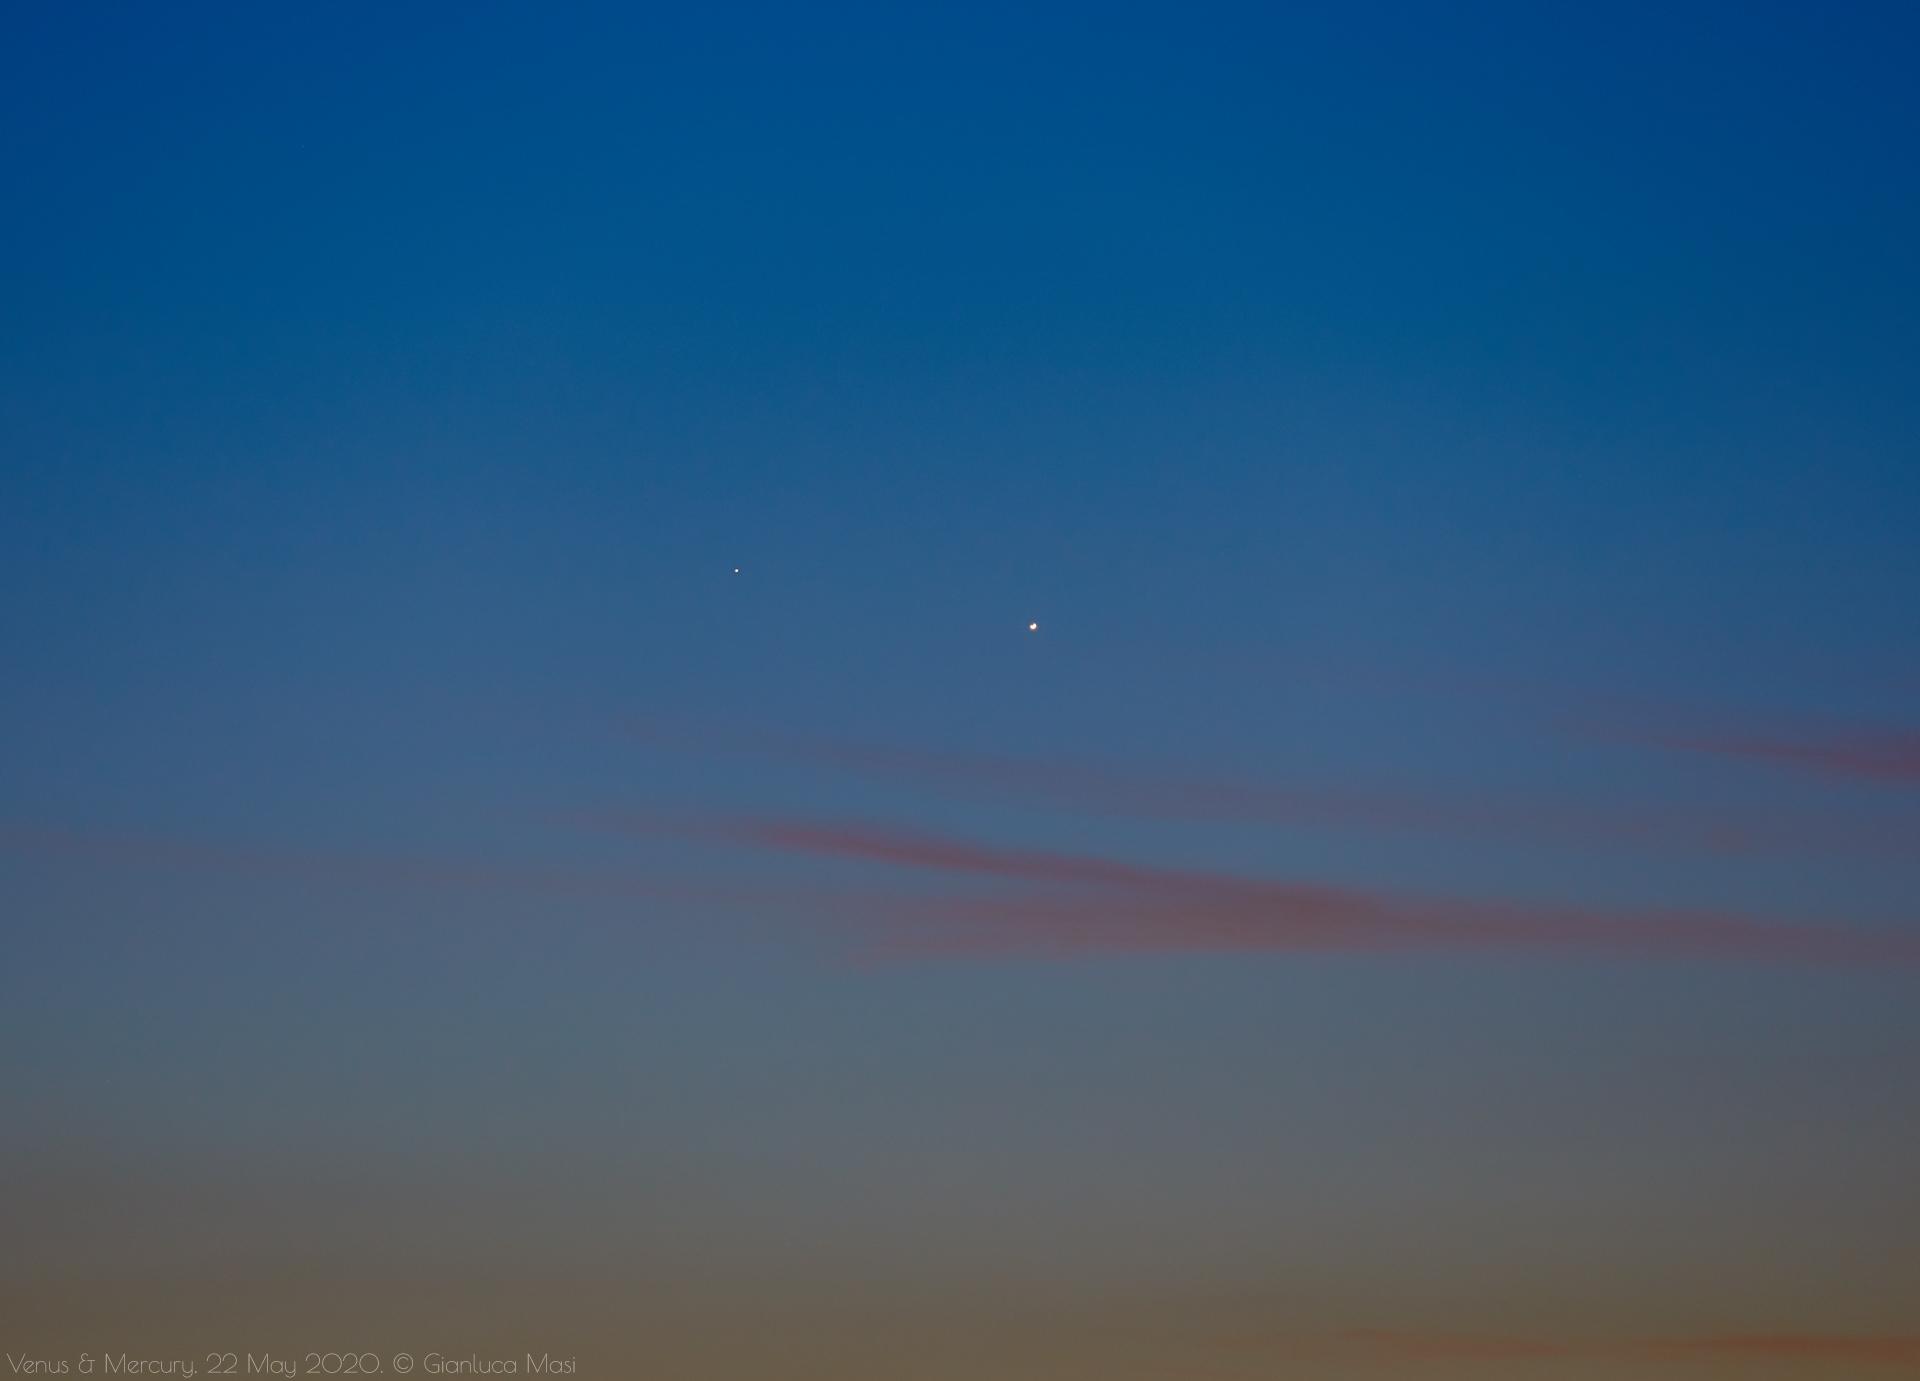 Venus and Mercury - 22 May 2020.